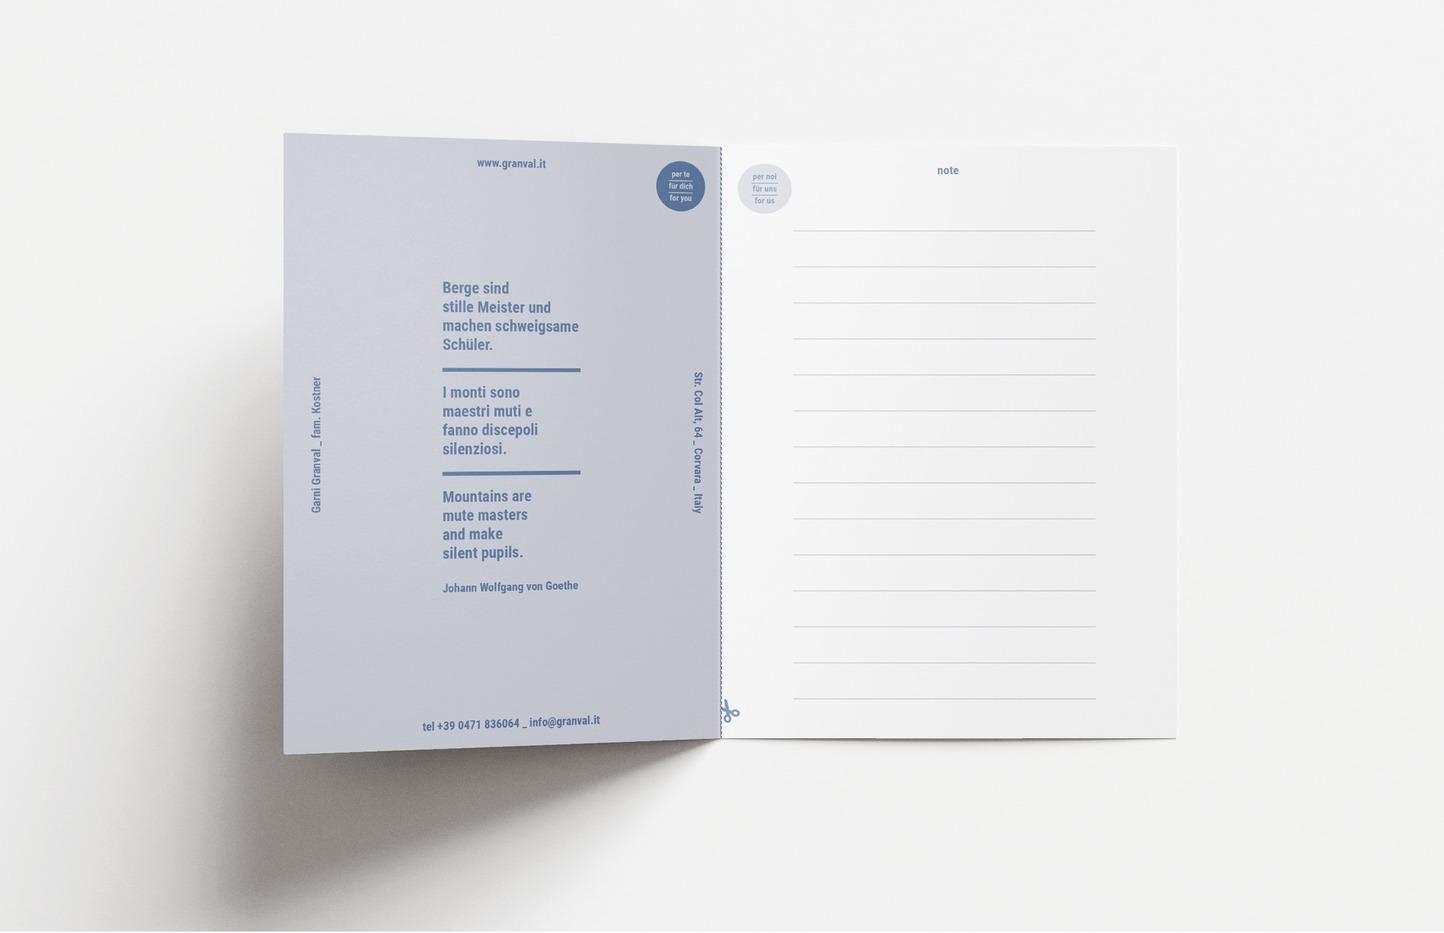 Benvenuti / Welcome info